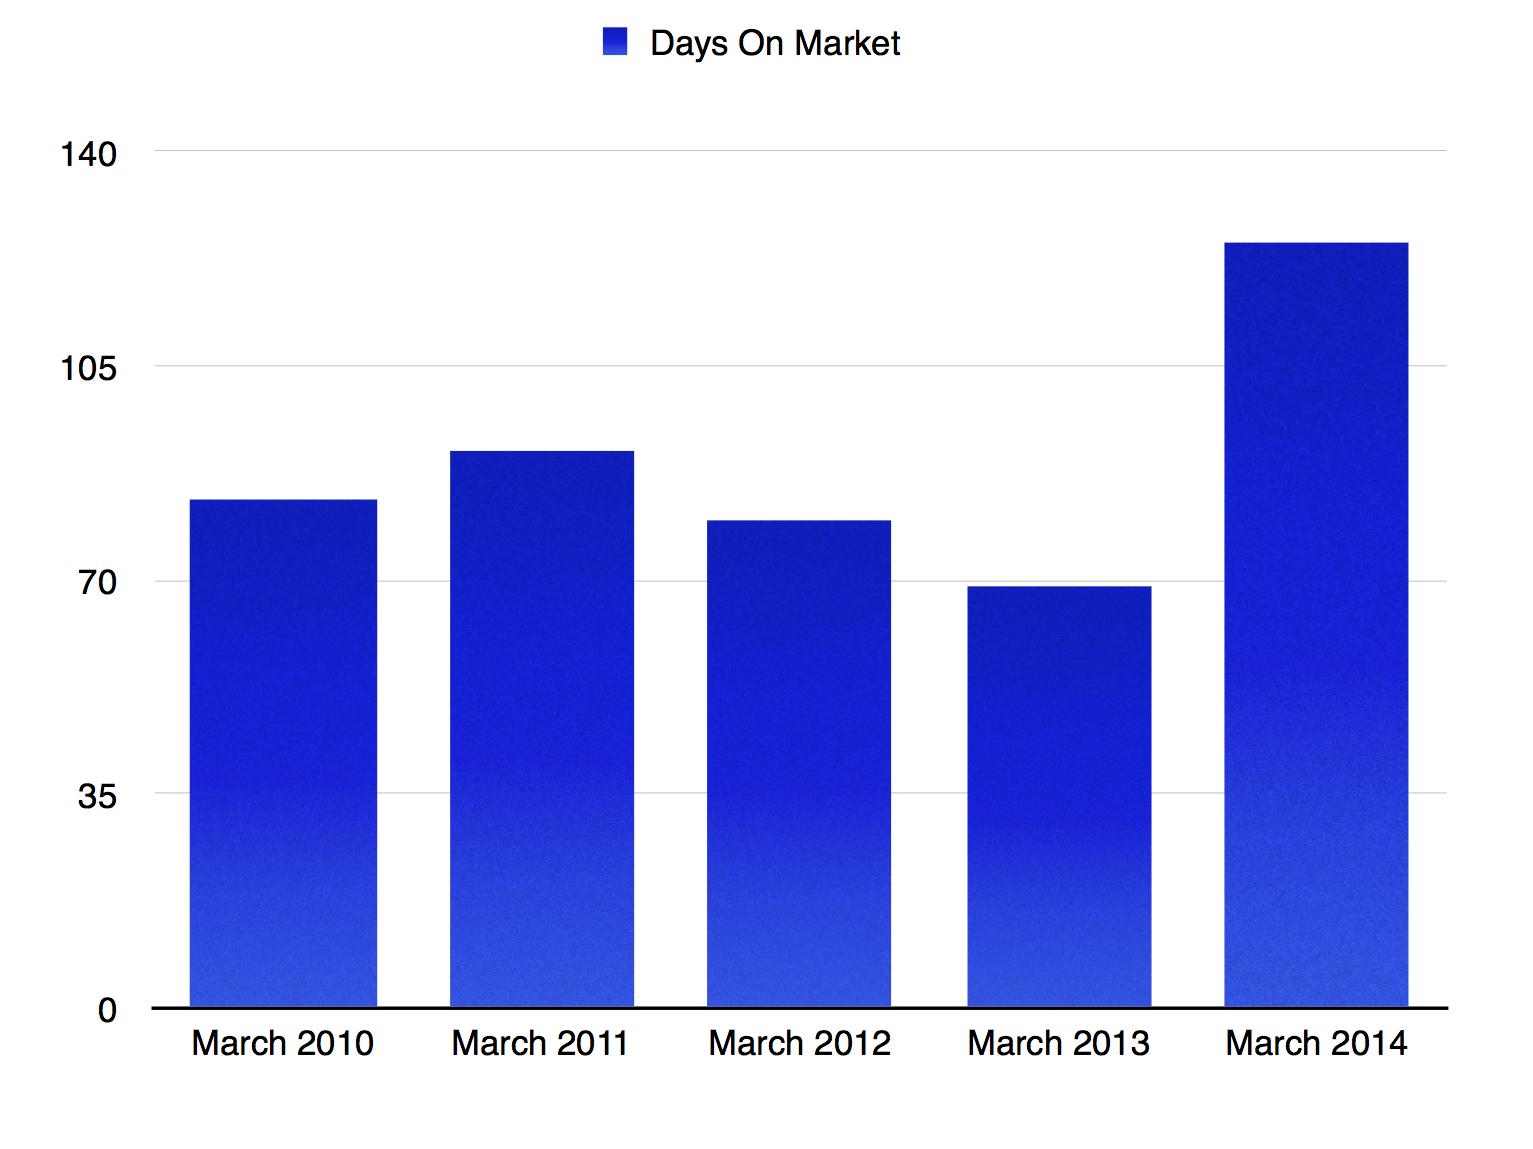 March Days On Market 2010-2014